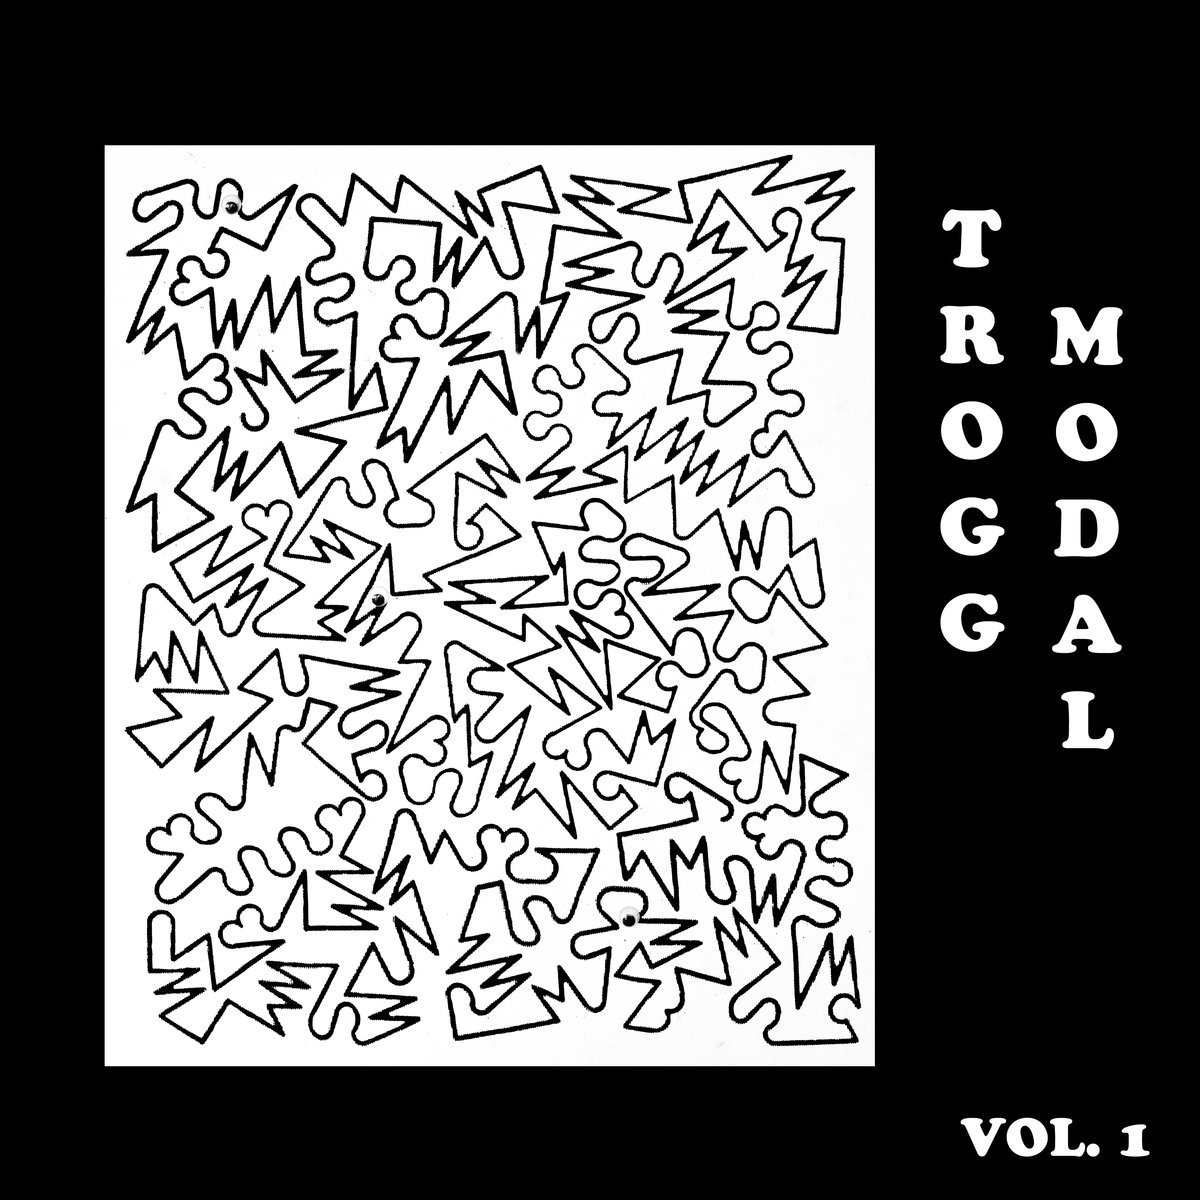 Eric Copeland - Trogg Modal Vol. 1 + 2